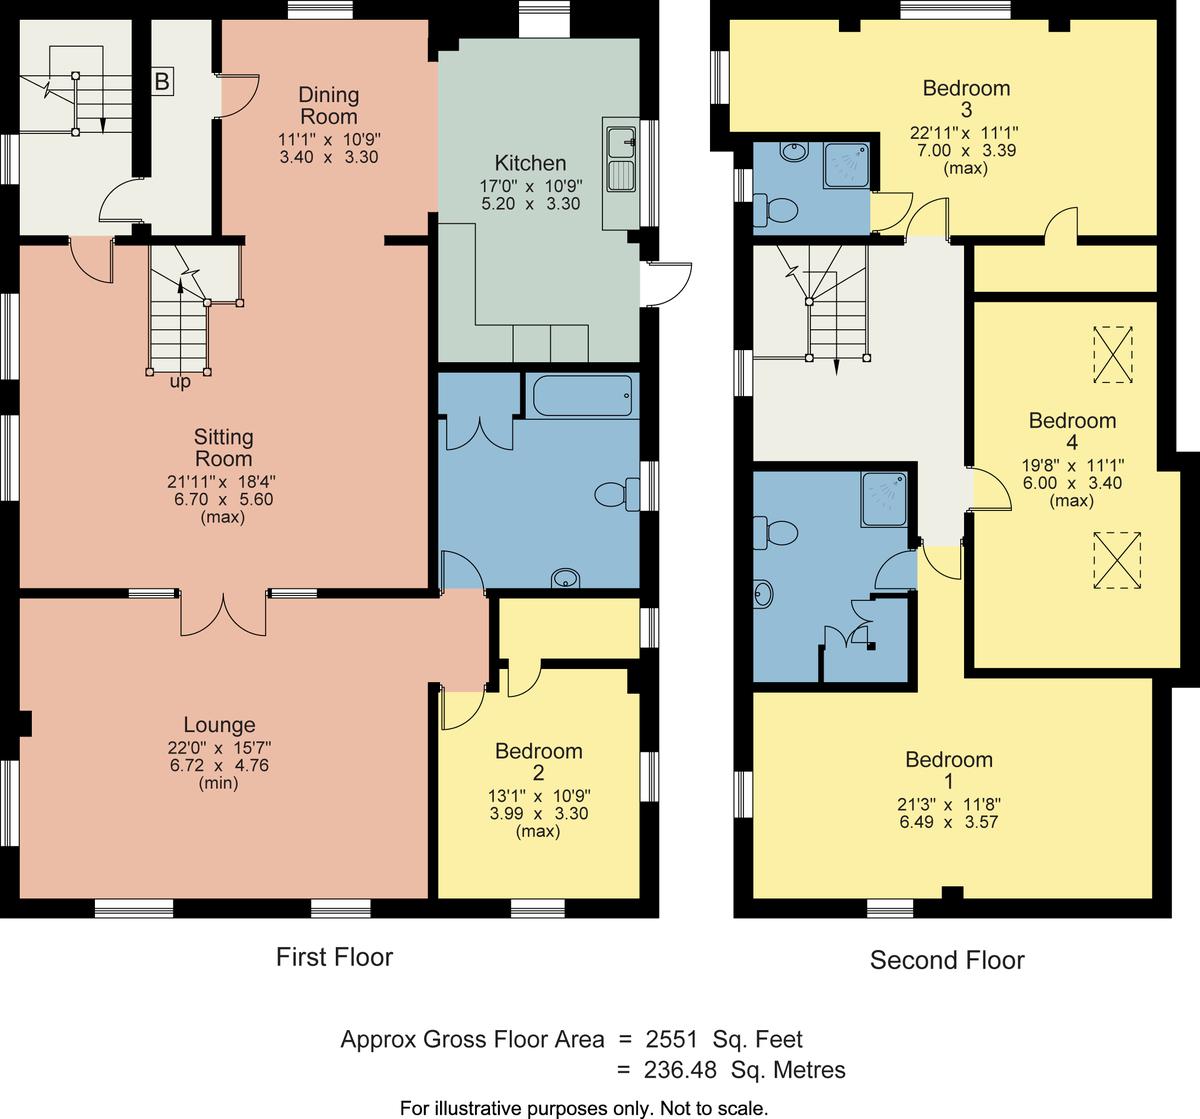 Floorplan 1 Cumbria House, Stock Lane, Grasmere, Ambleside LA22 9SJ